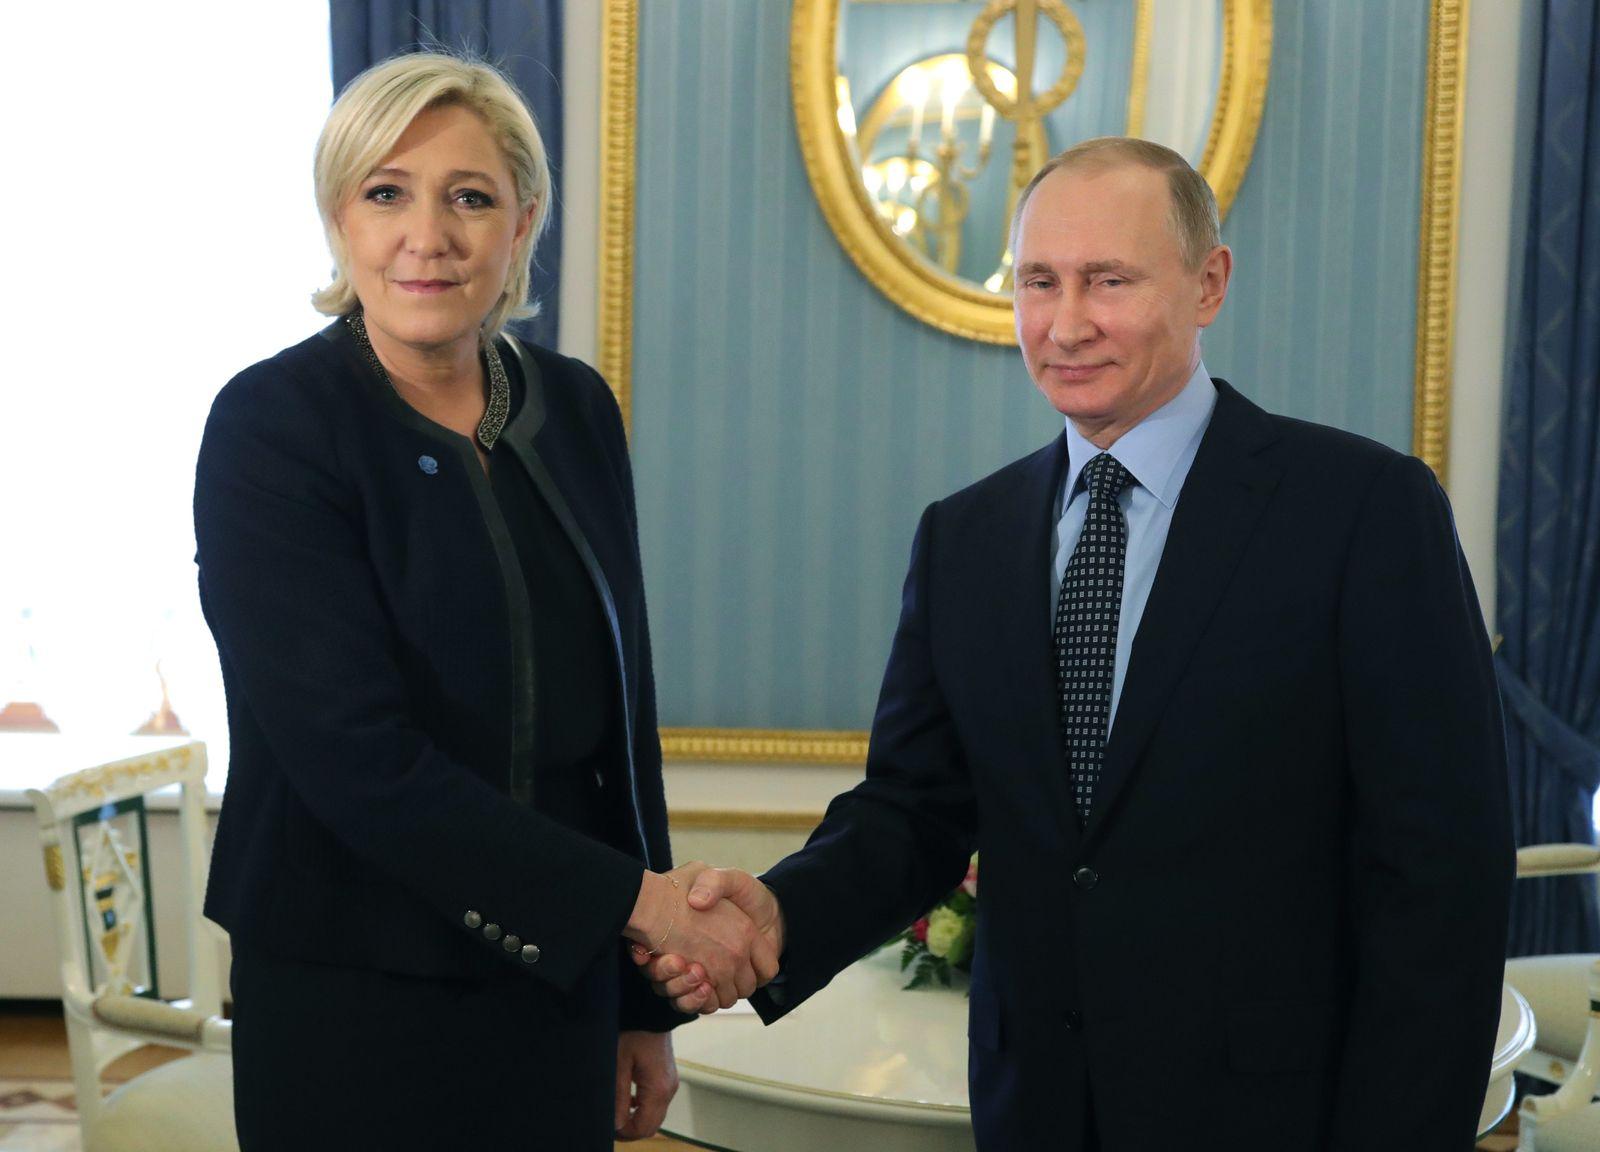 Le Pen / Putin